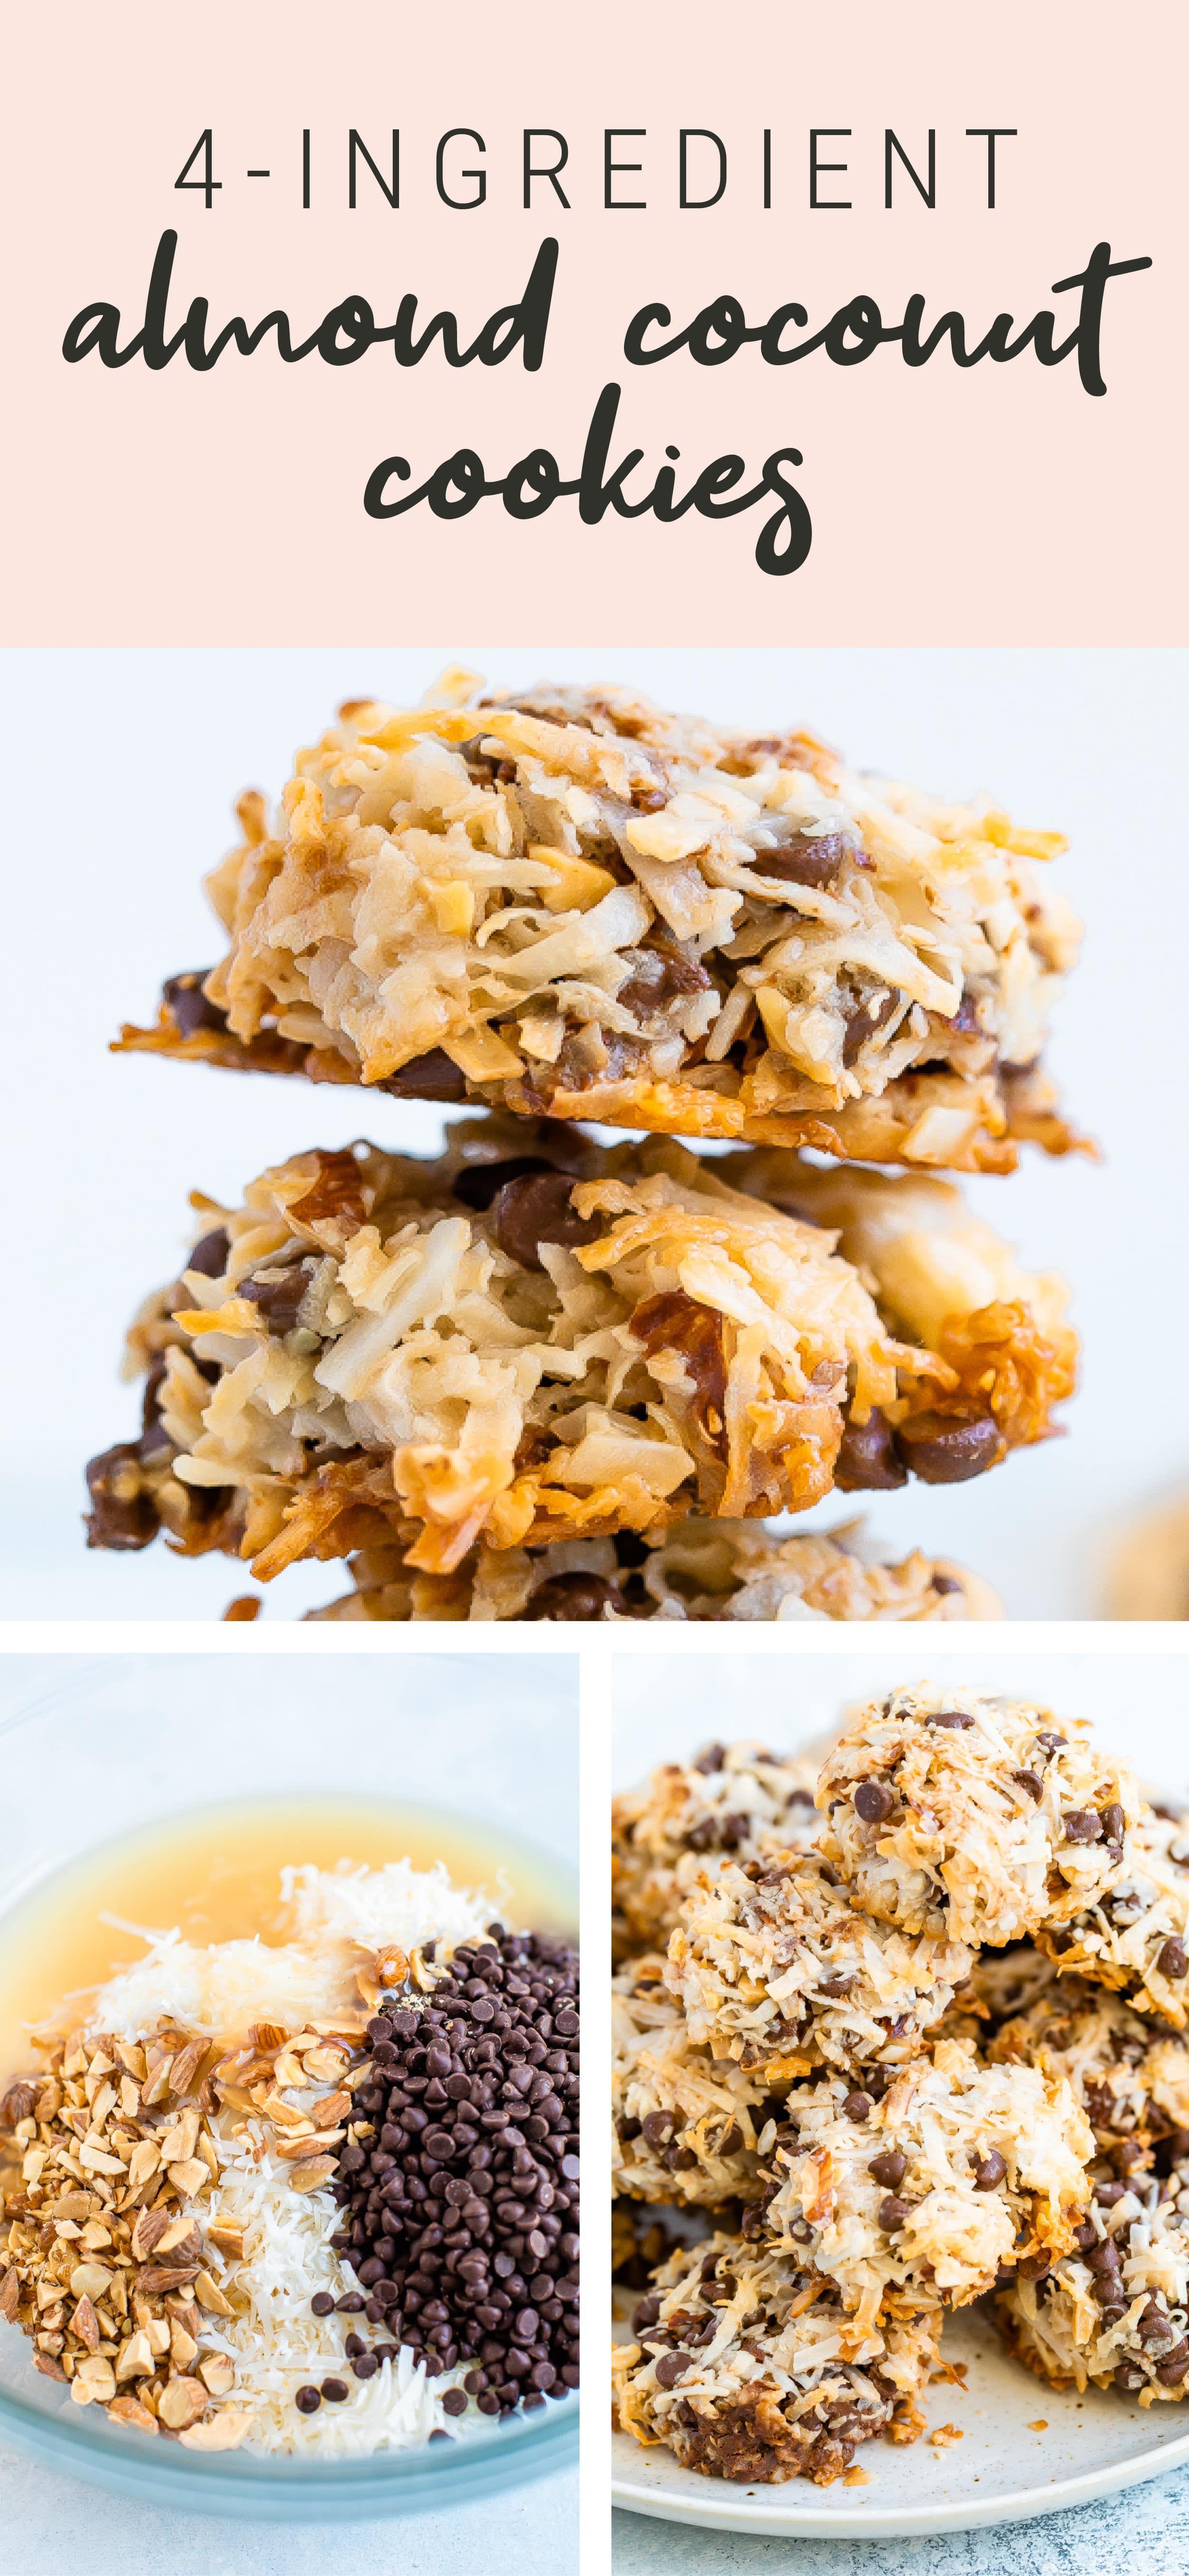 4-Ingredient Almond Coconut Cookies